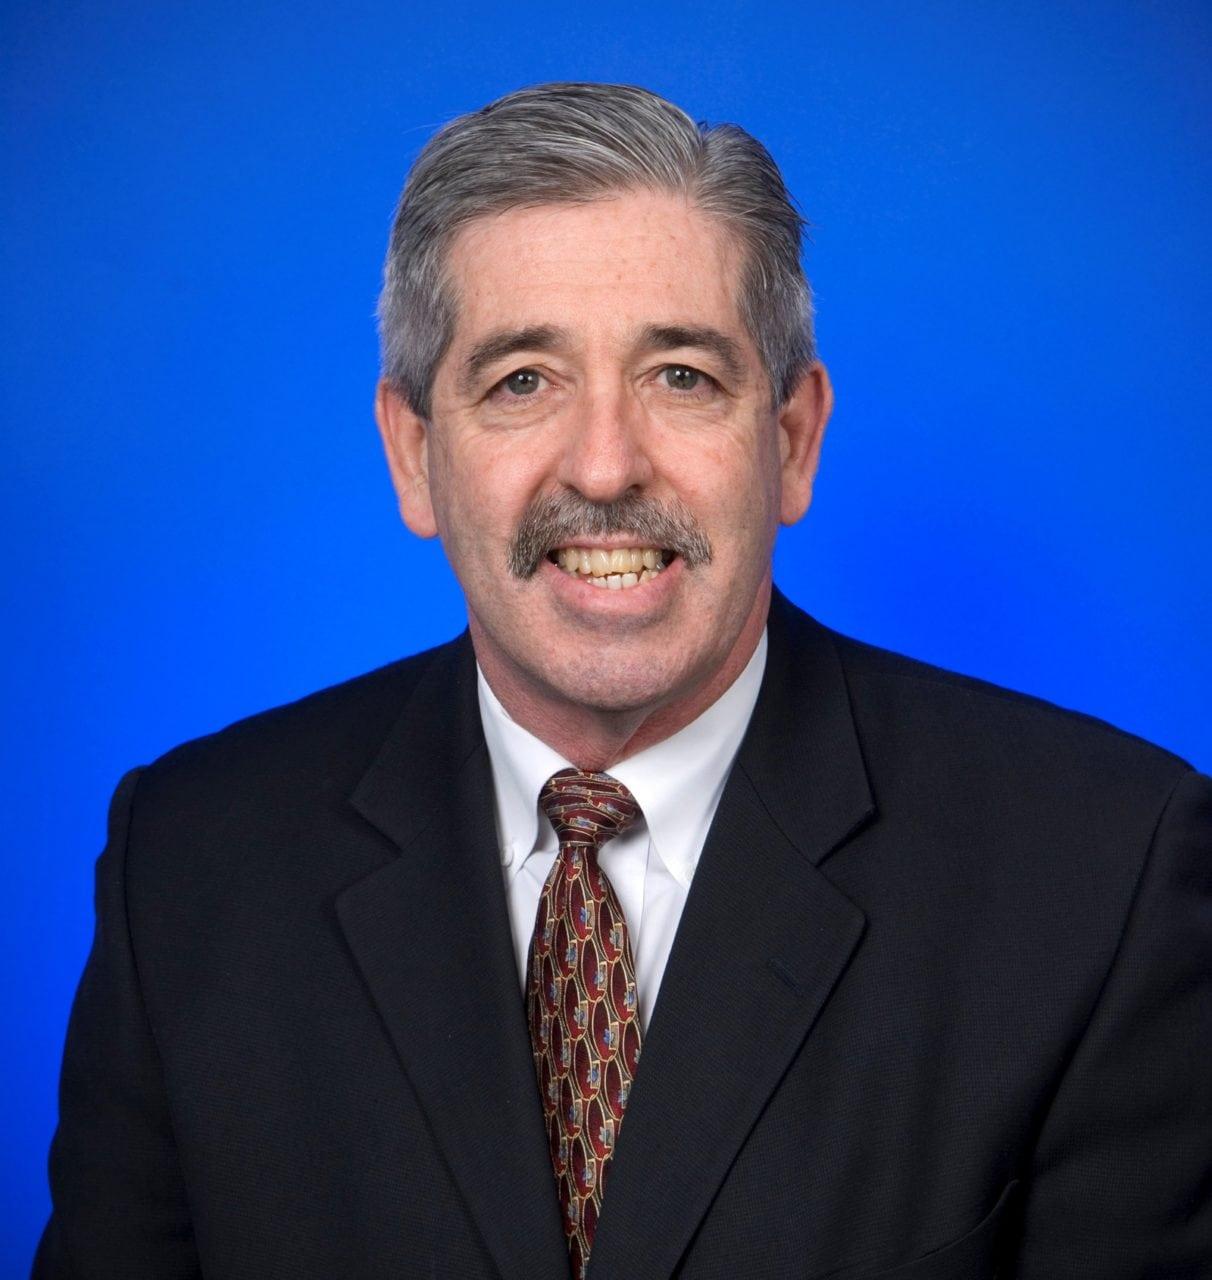 Tim Mahoney, CEO, Honeywell Aerospace. Photo: Honeywell